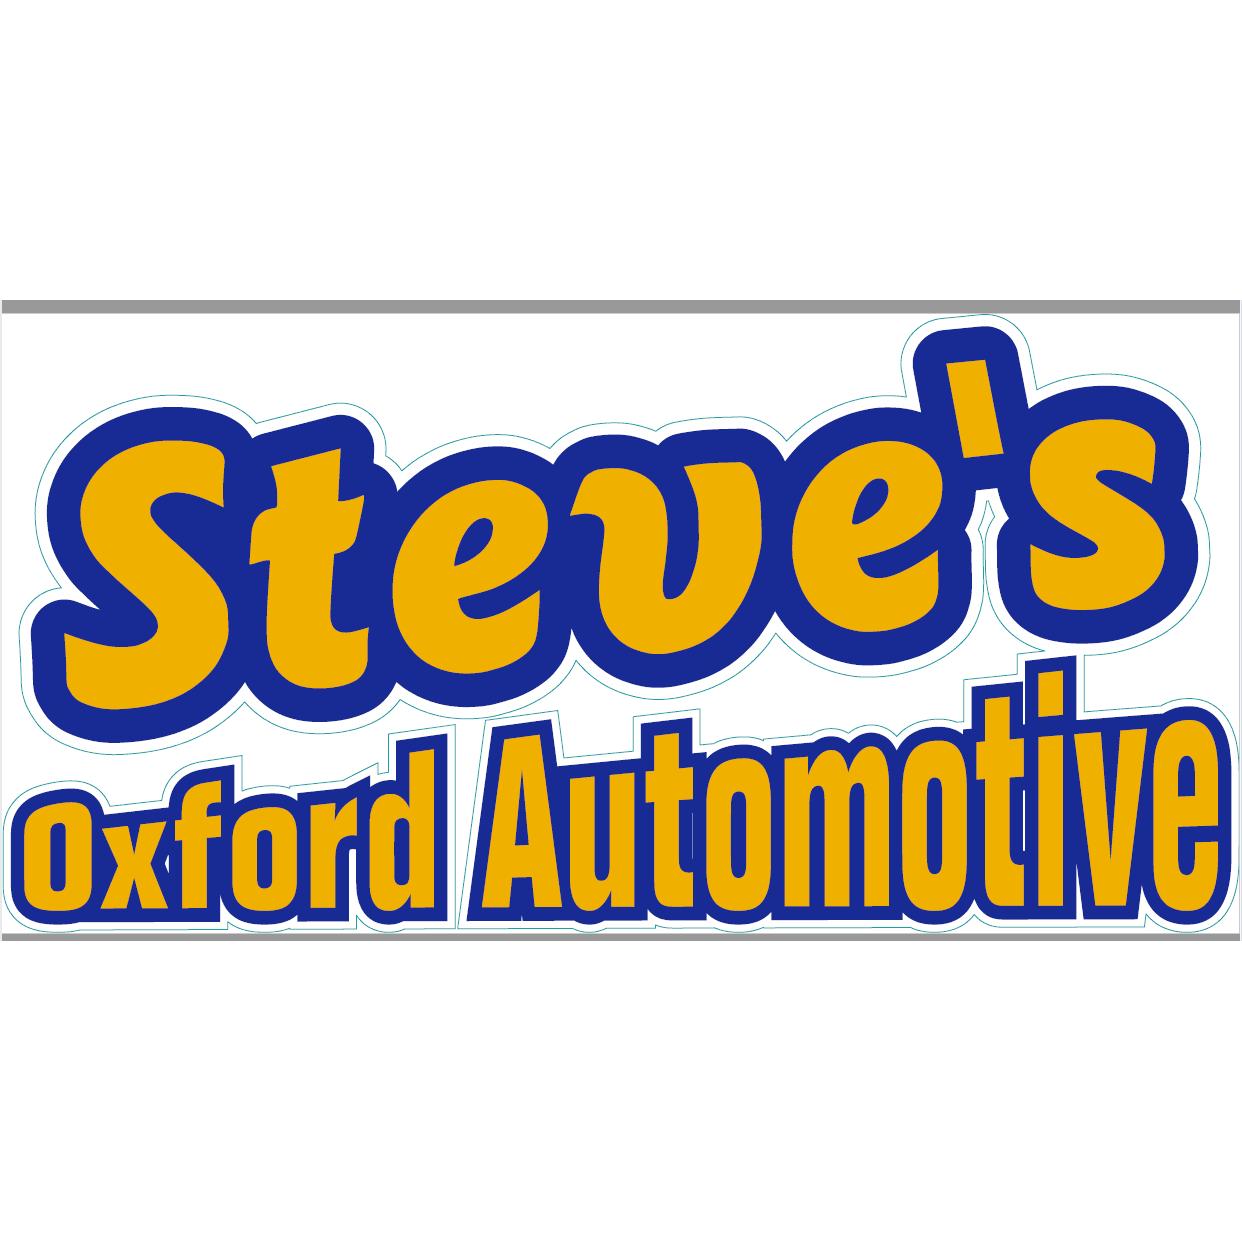 Steve's Oxford Automotive - Oxford, MI - Auto Parts